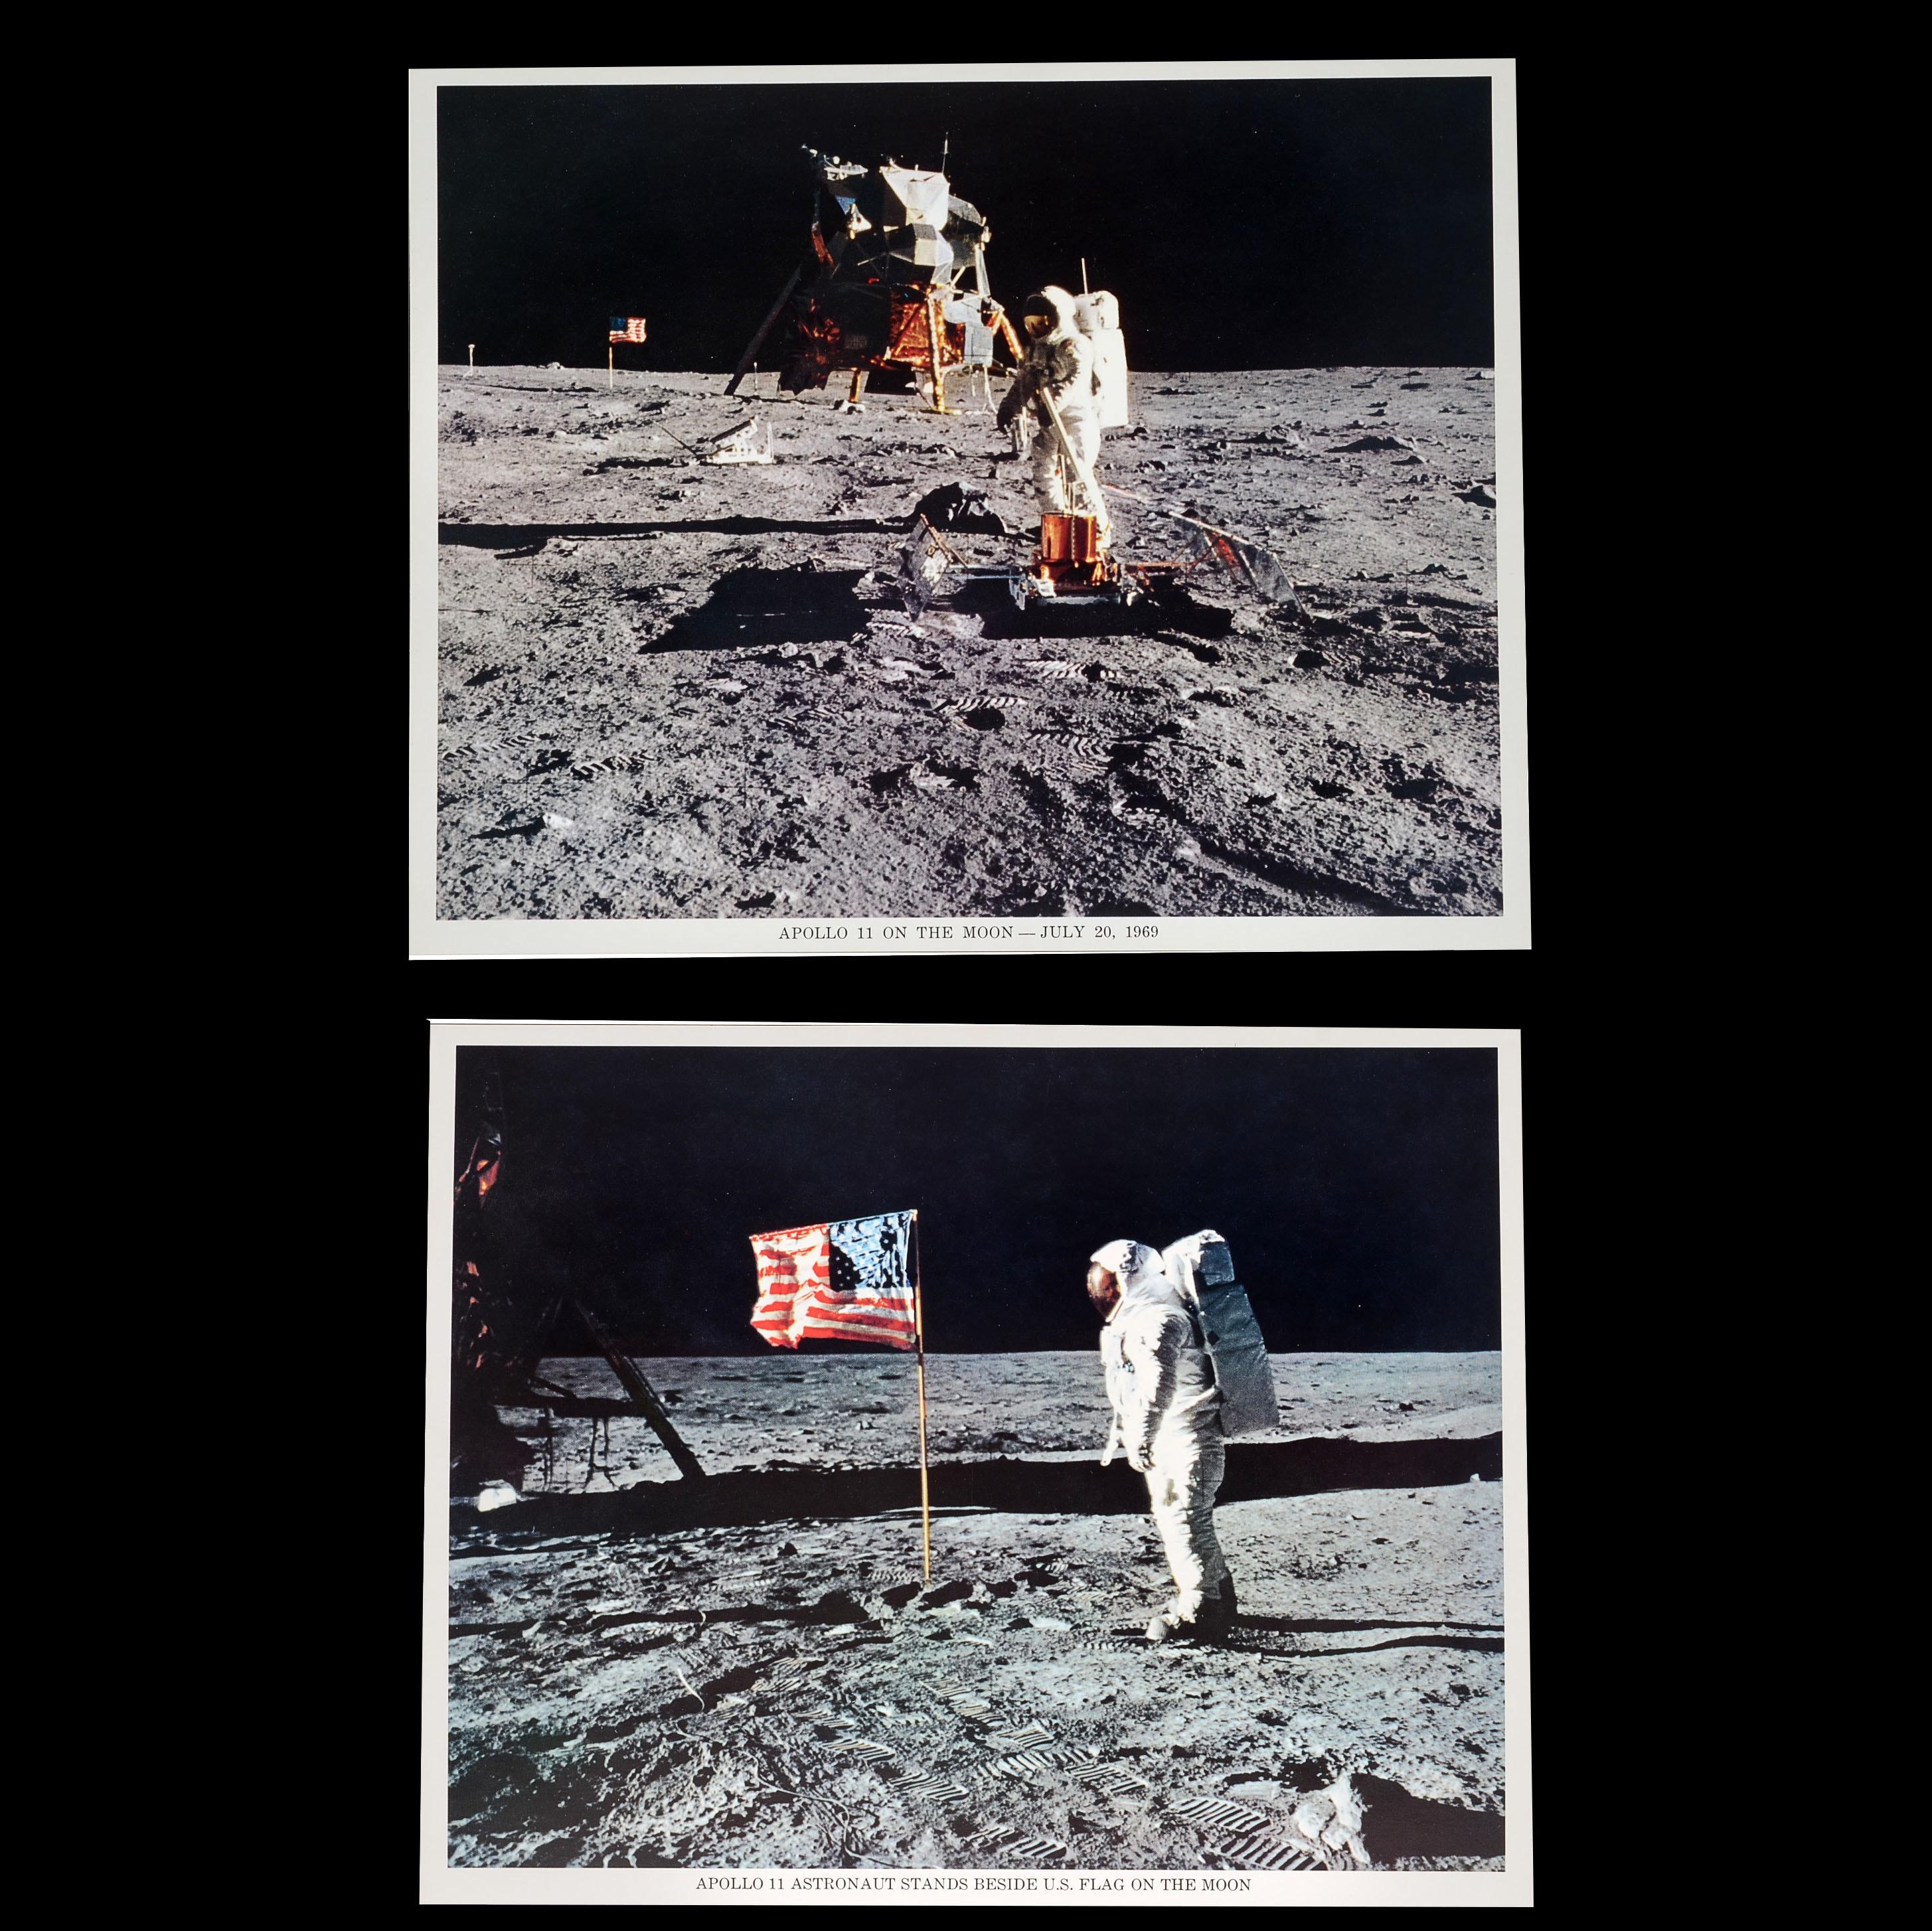 Two Apollo 11 Color Lithographic Publicity Prints